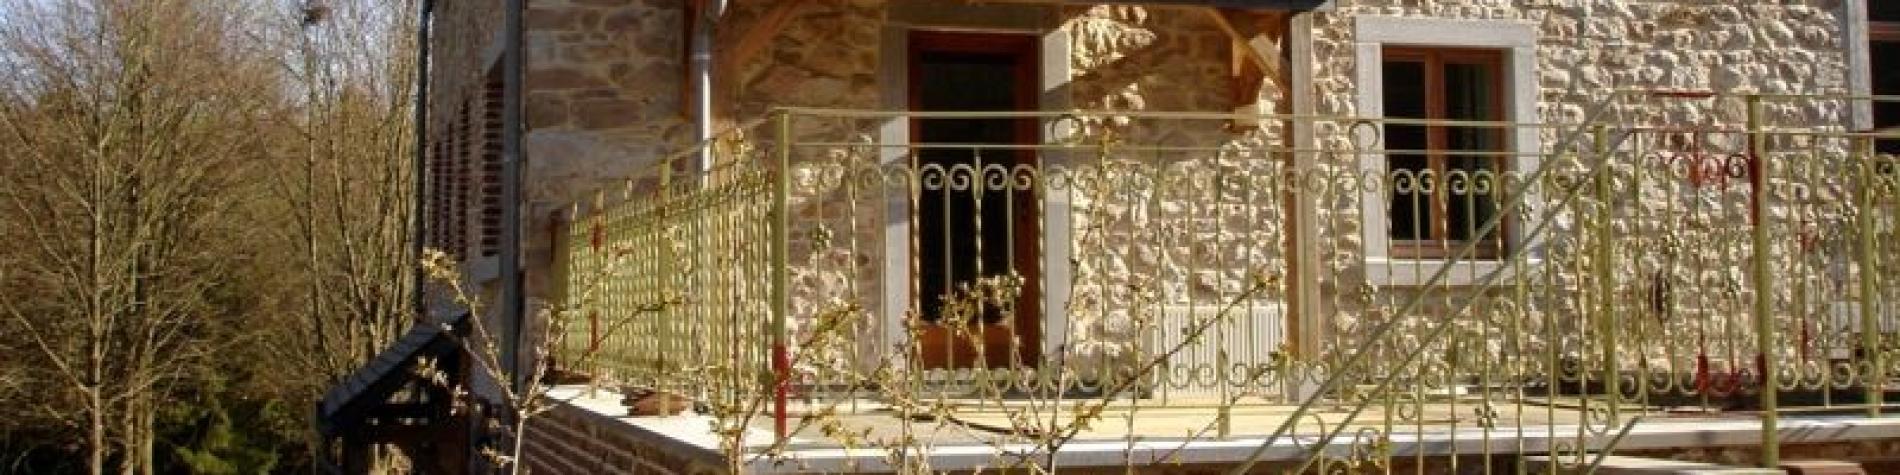 Gîte rural de Regniessart - Petit gîte - Nismes